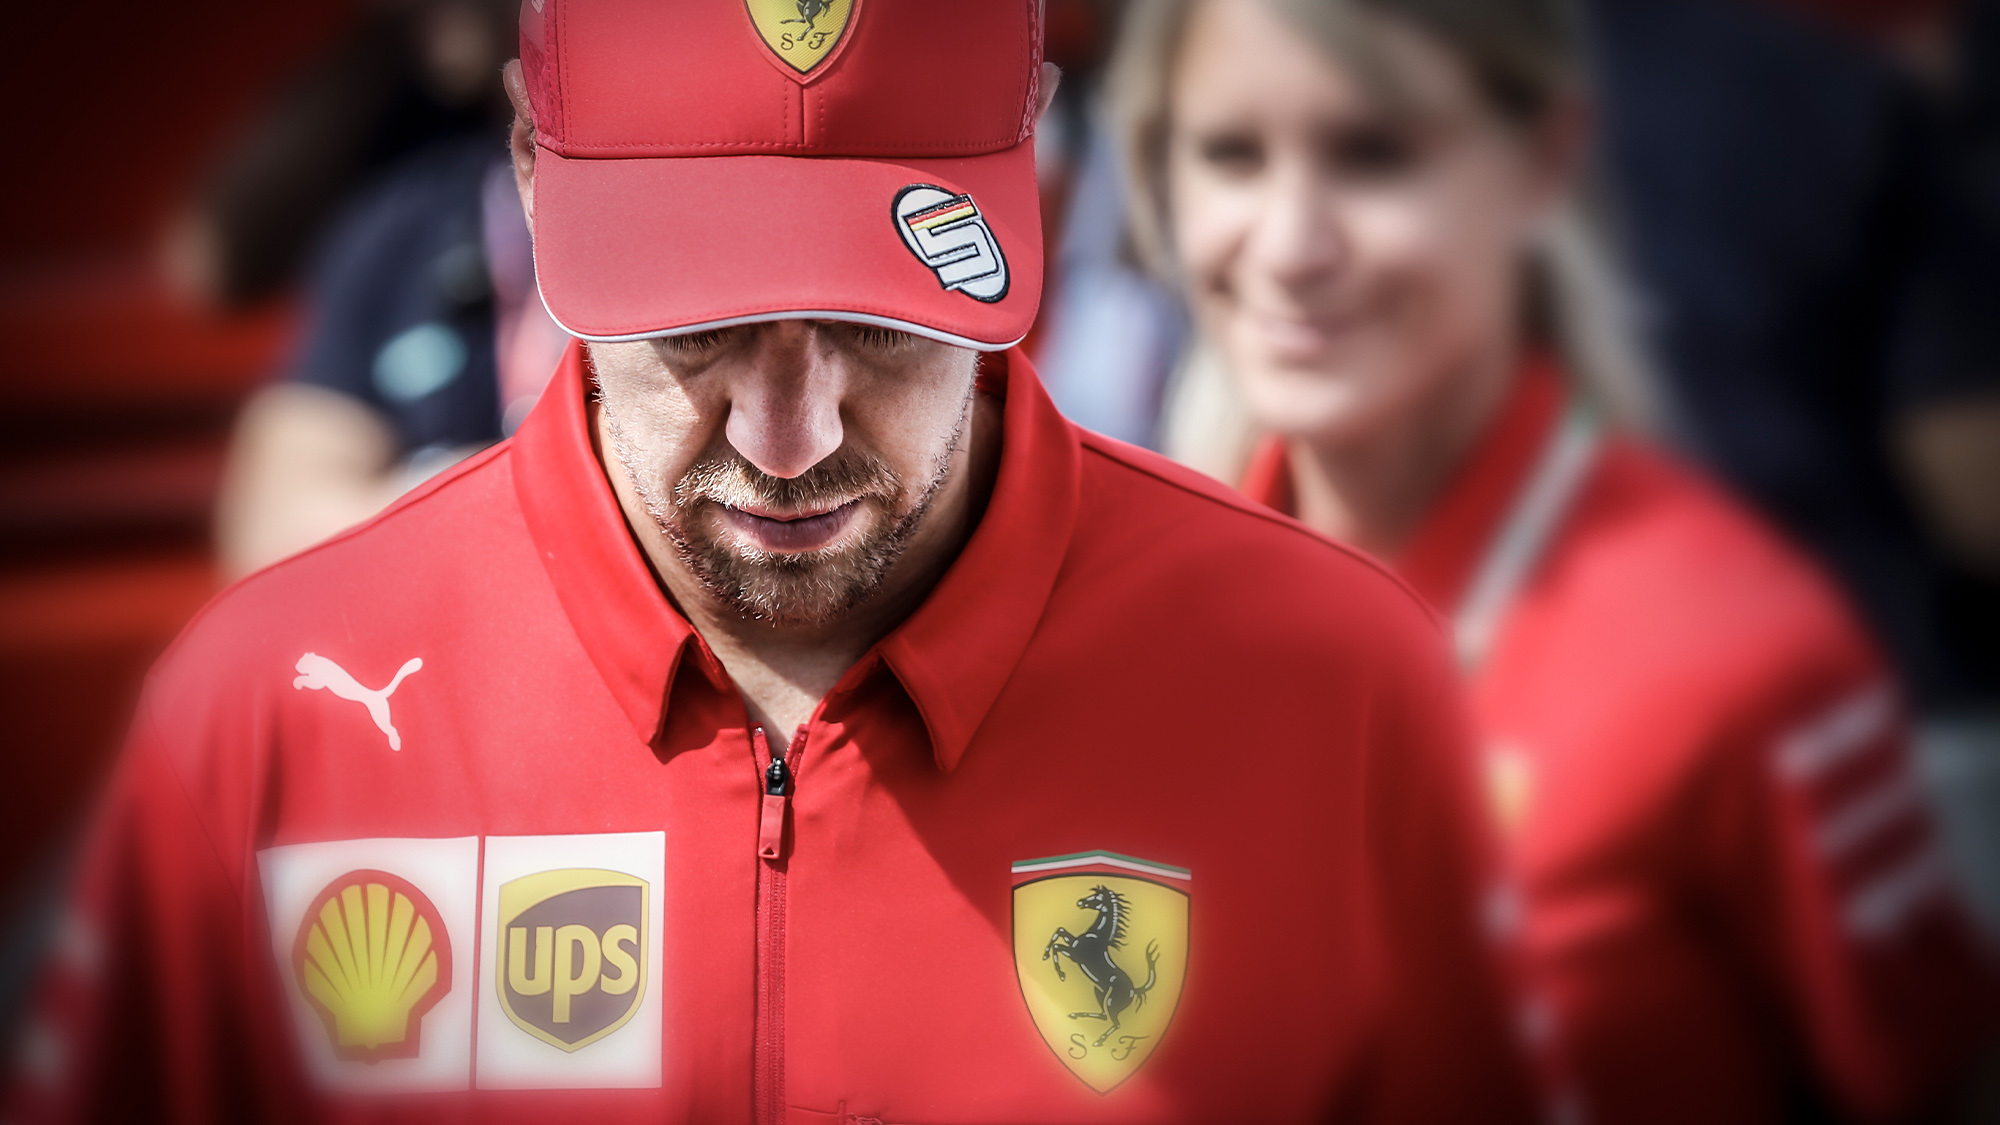 Sebastian Vettel in Ferrari clothing with his head down and cap on